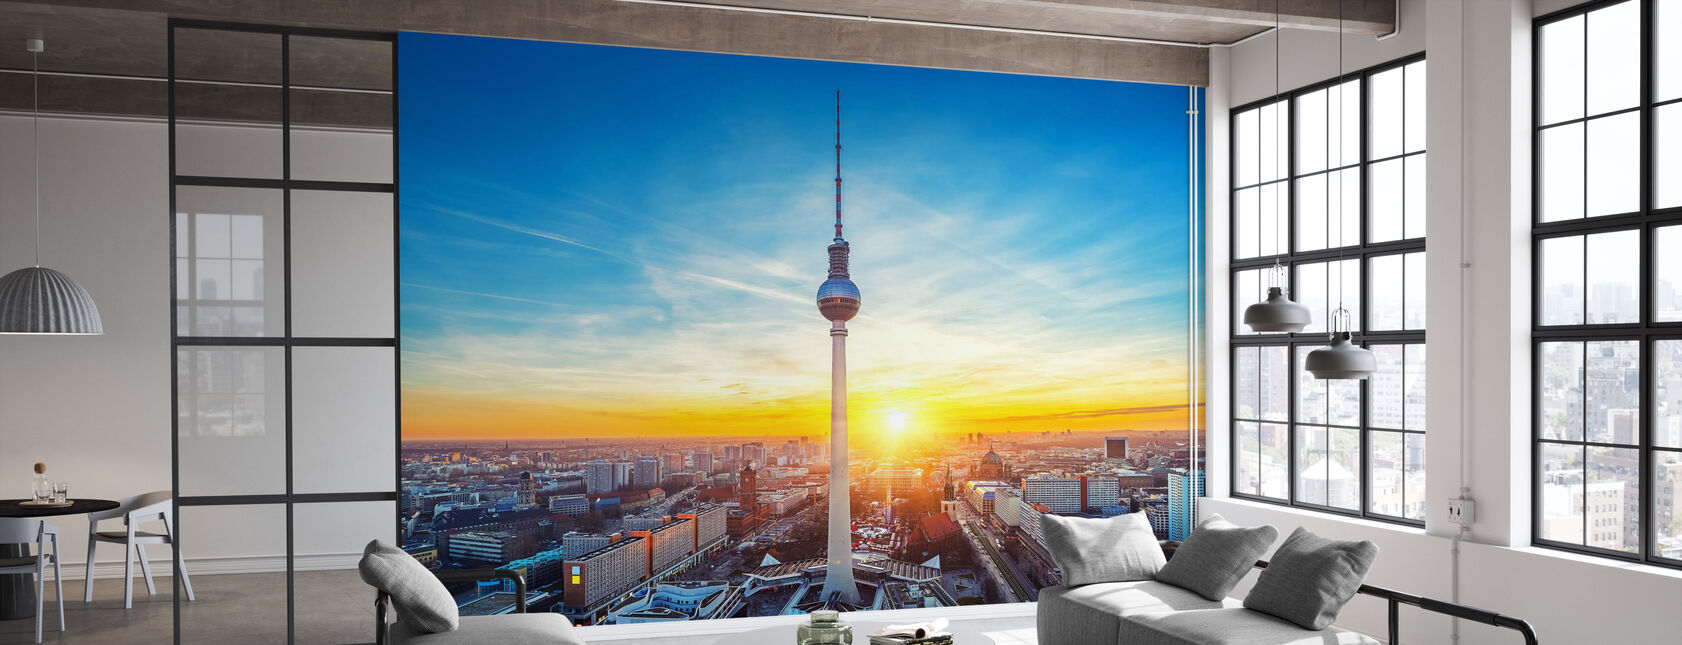 Holiday Inn Express Berlin City Centre - Wallpaper - Office